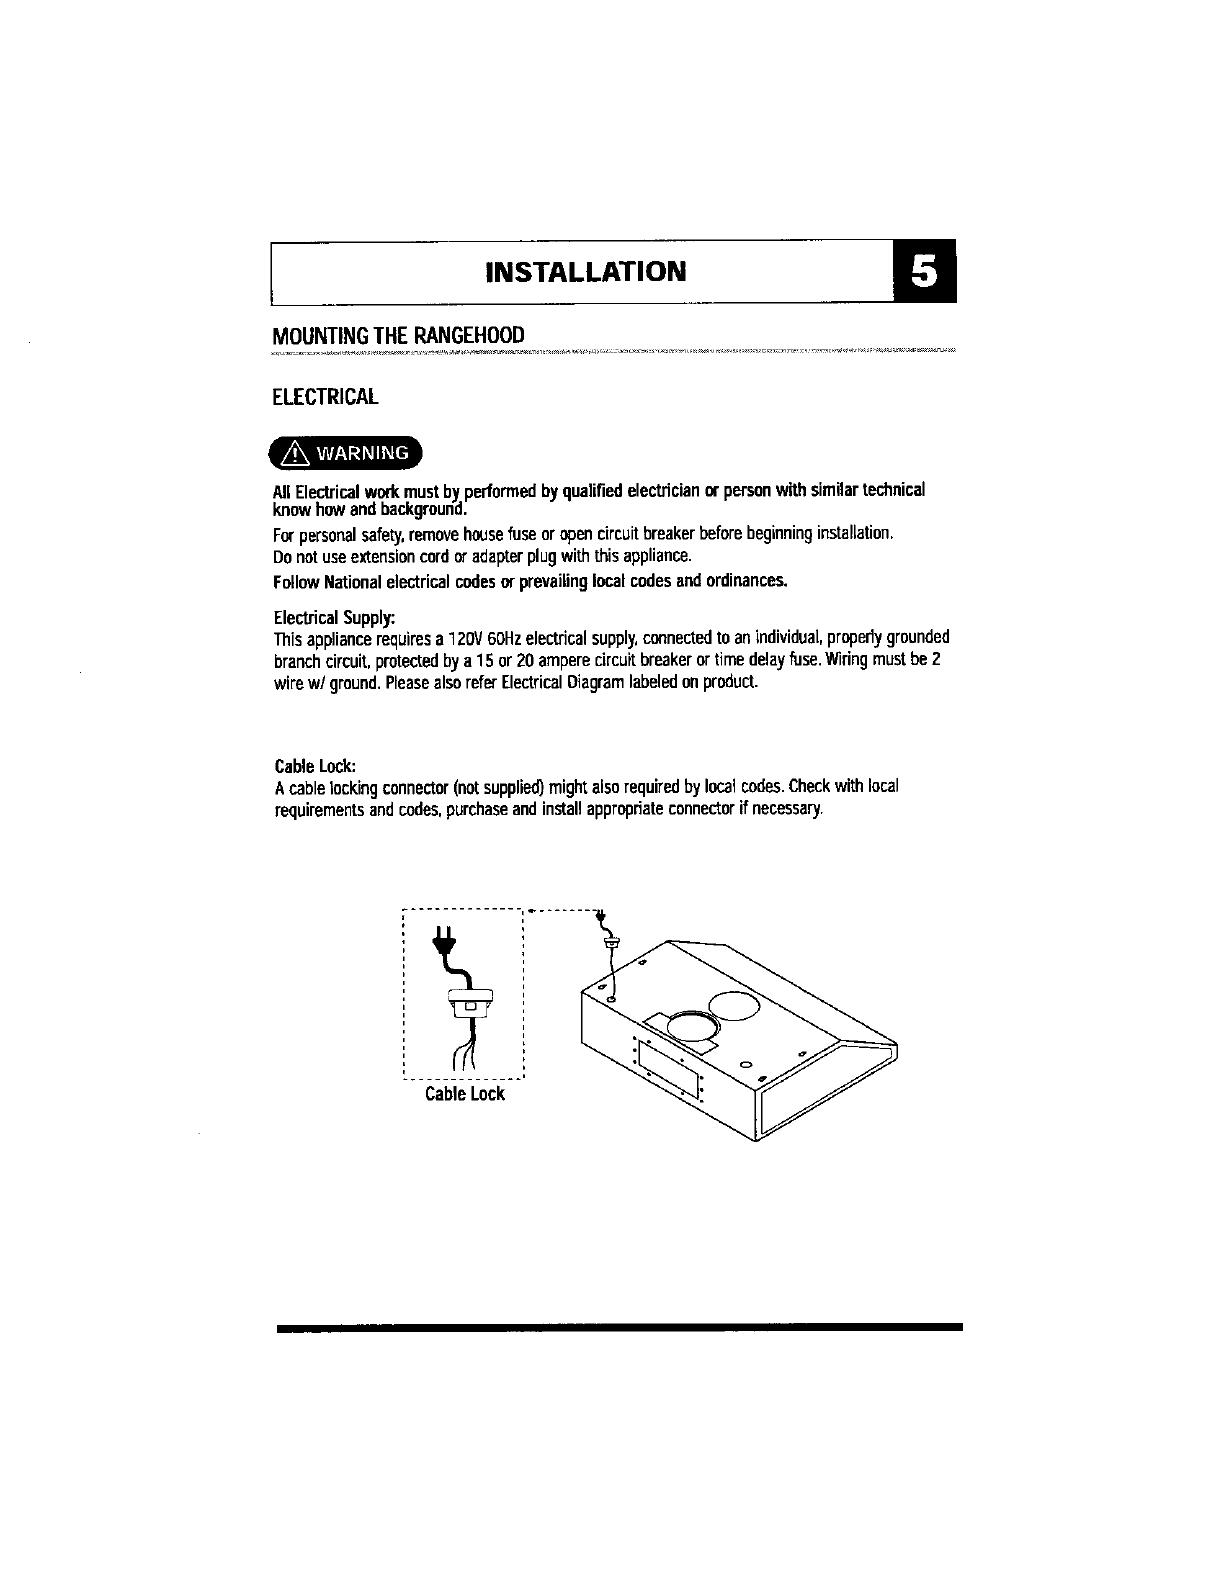 Maytag Range Hood Manual L0407192 House Wiring Open Circuit